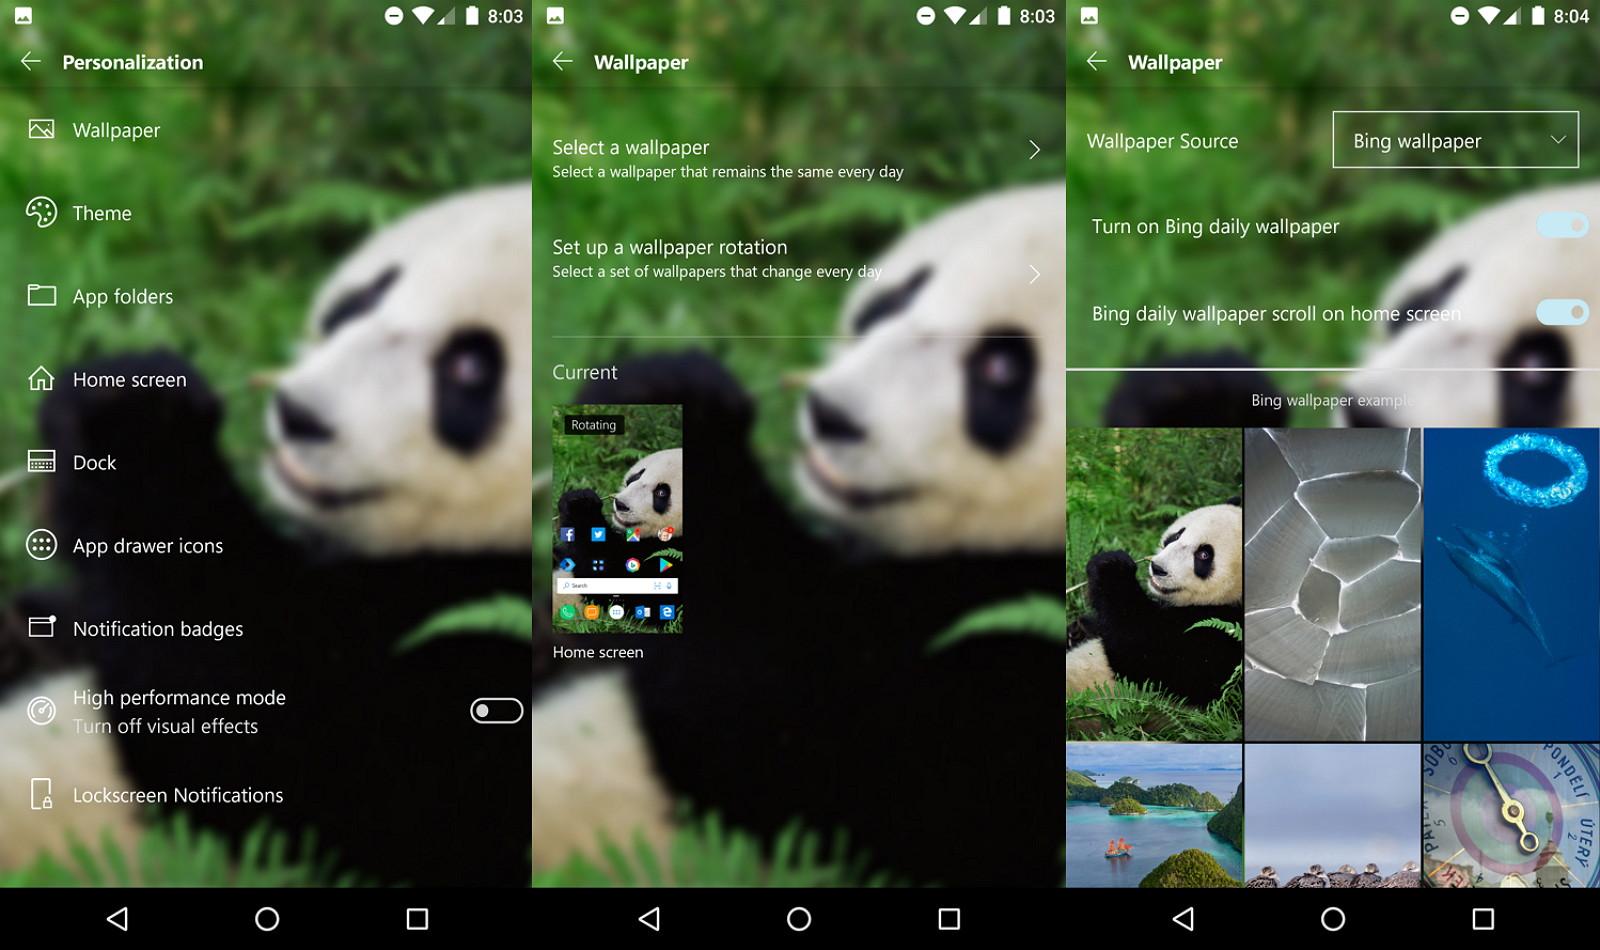 Microsoft Launcher wallpaper setup